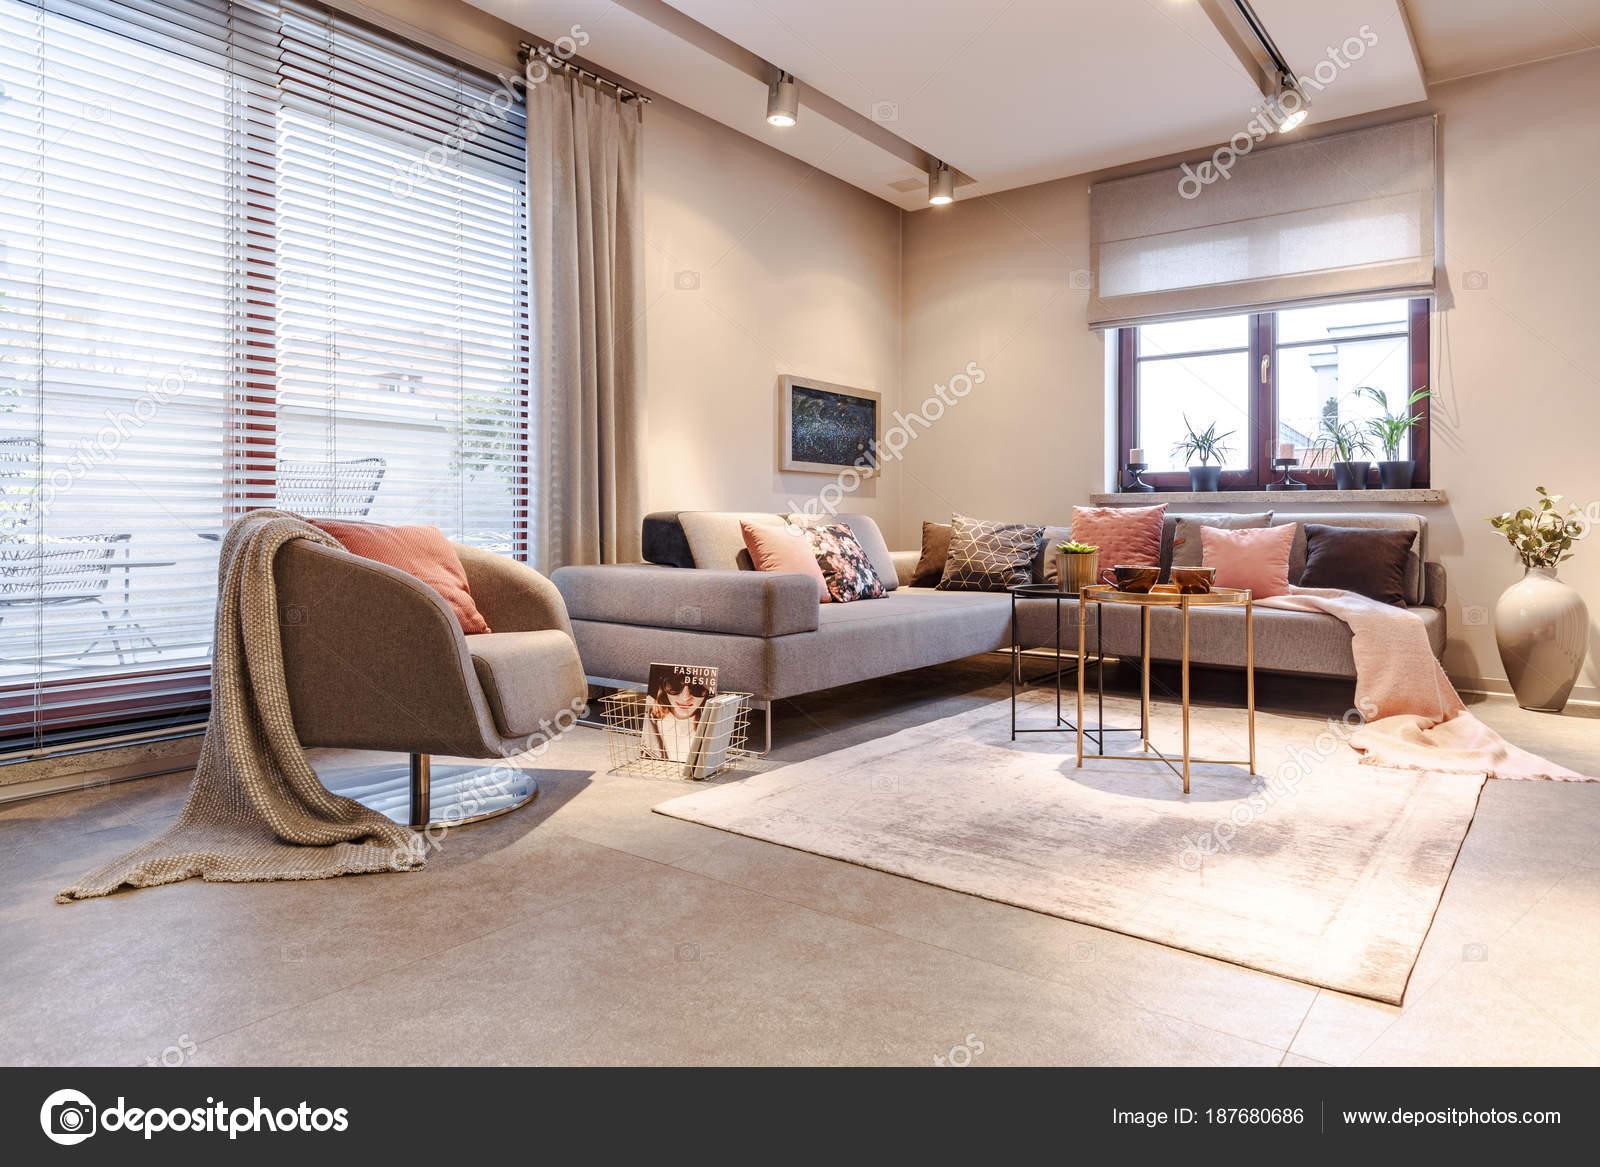 Ferienwohnung grau Interieur — Stockfoto © photographee.eu #187680686